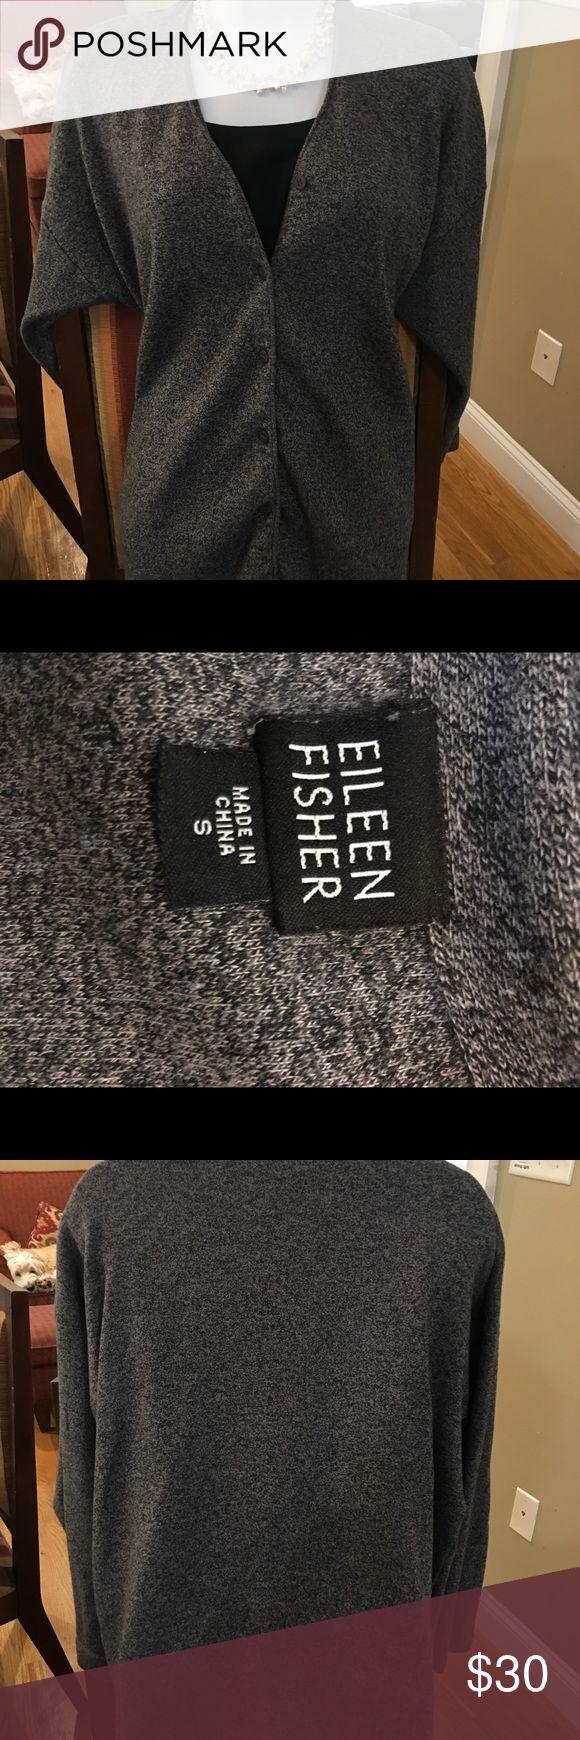 Eileen Fisher Gray Heather cardigan Women's small Gray cardigan, 100% cotton. Eileen Fisher Sweaters Cardigans